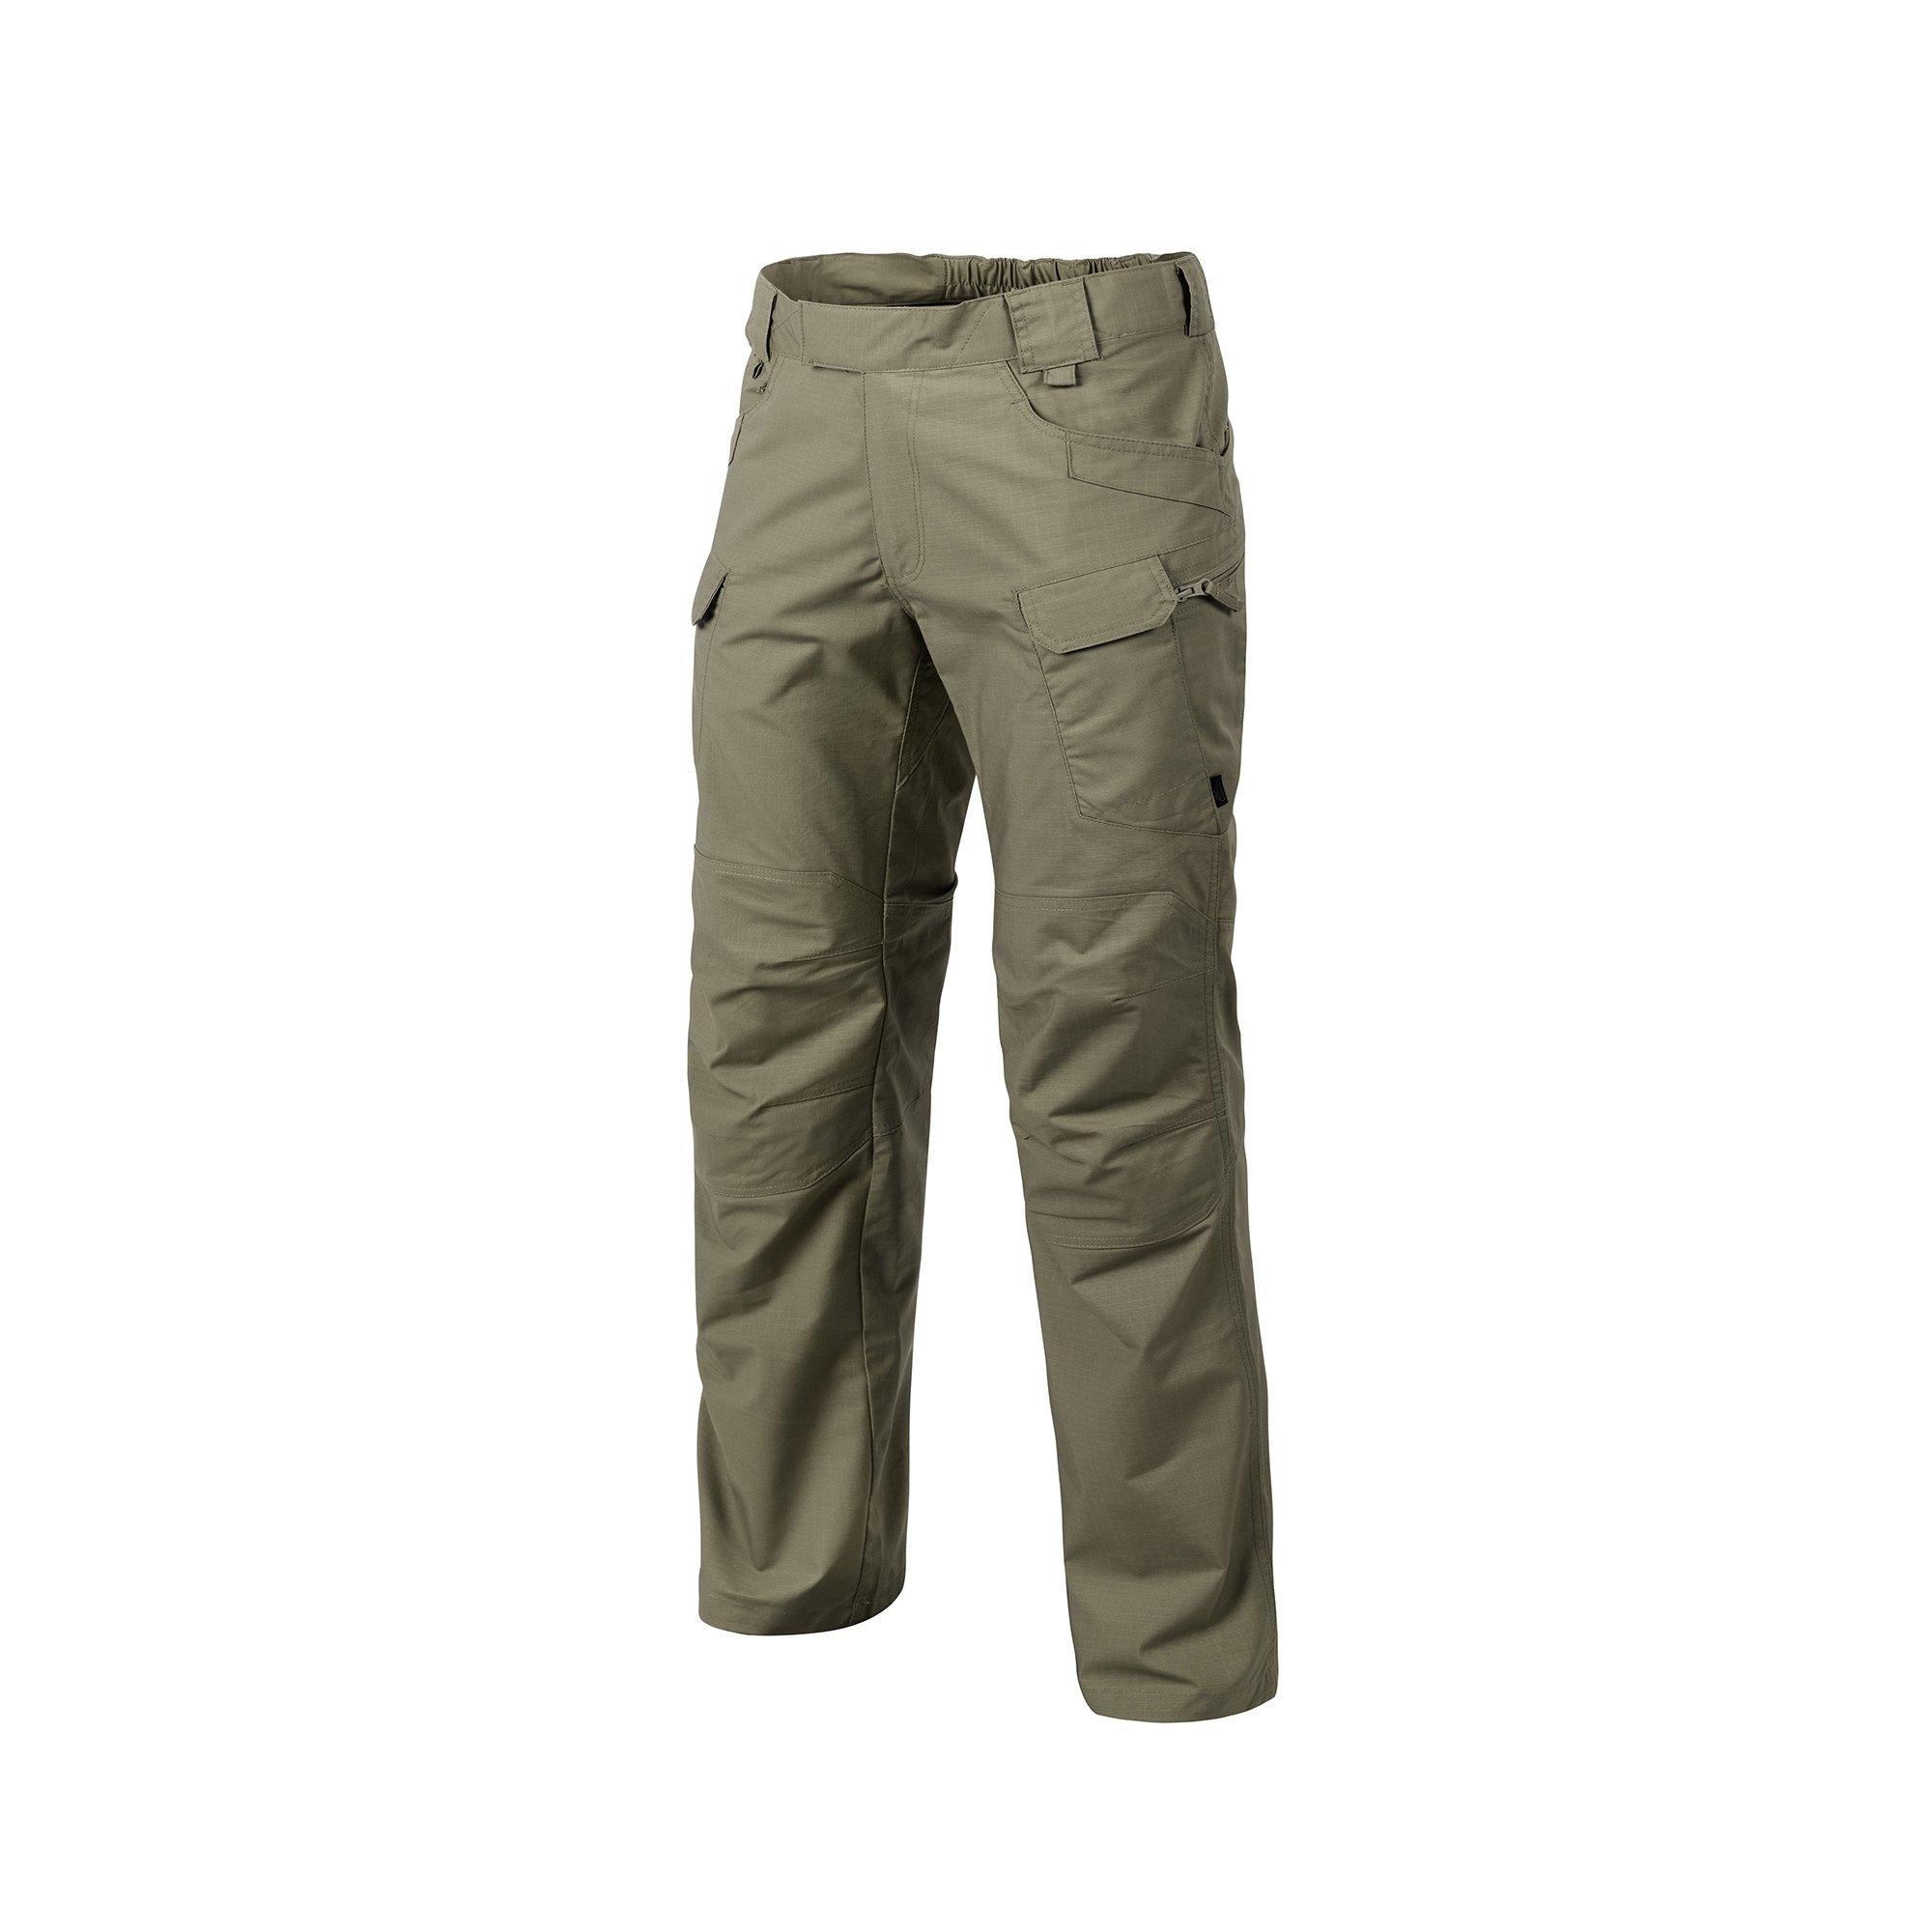 HELIKON-TEX Urban Line, UTP Urban Tactical Pants, Military Ripstop Cargo Style, Men's